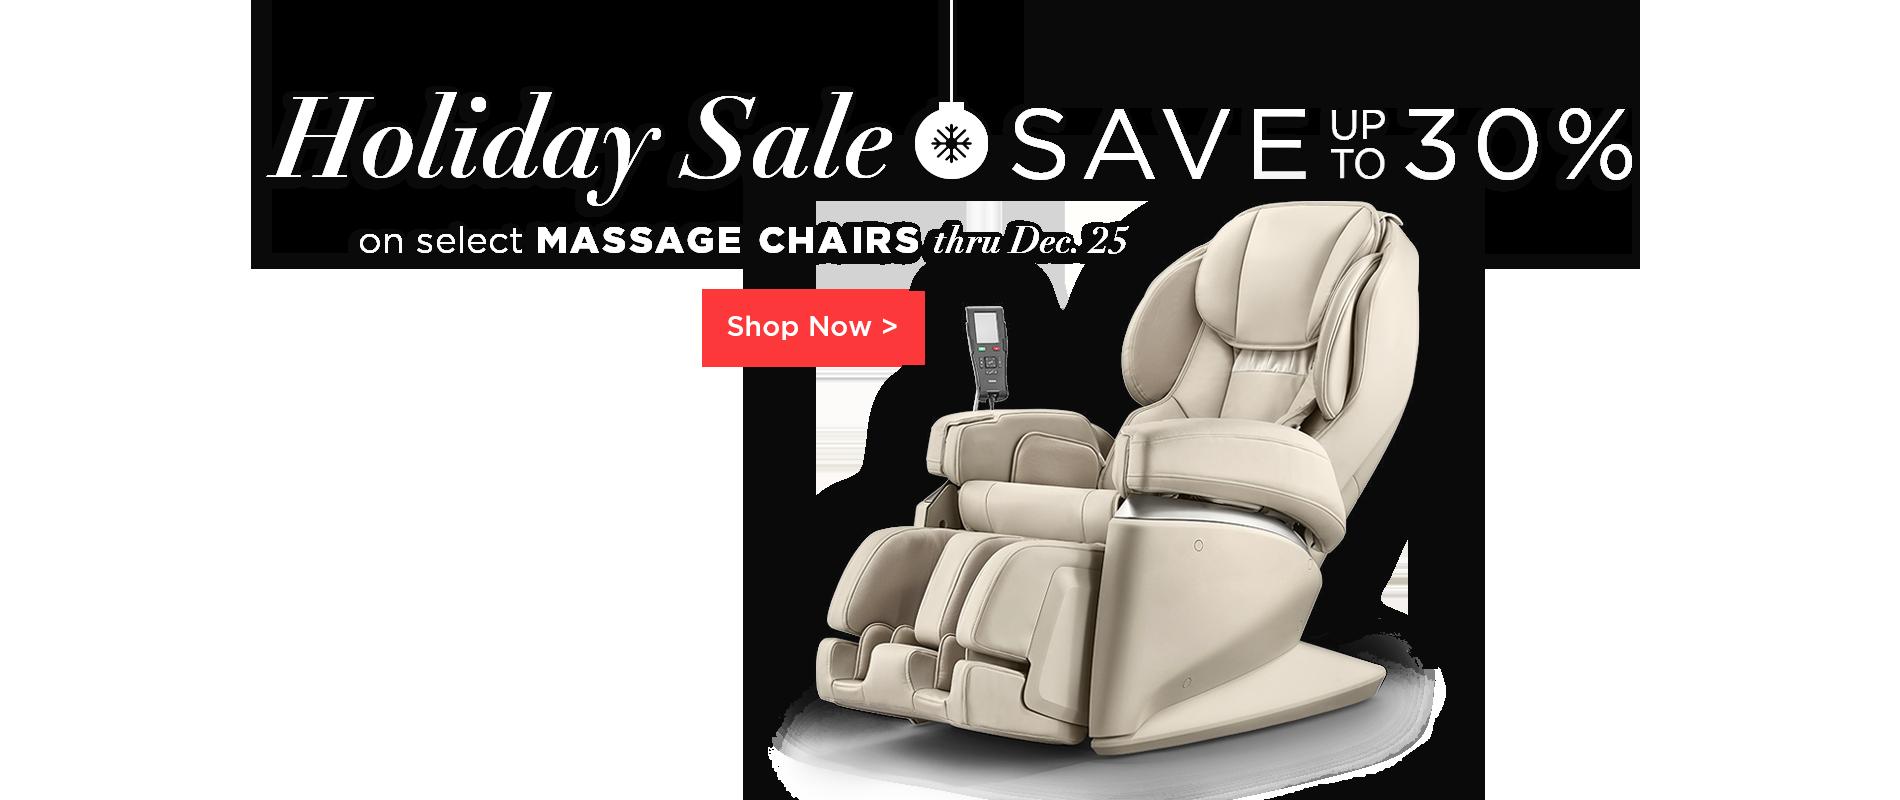 Holiday Sale - Massage Chairs